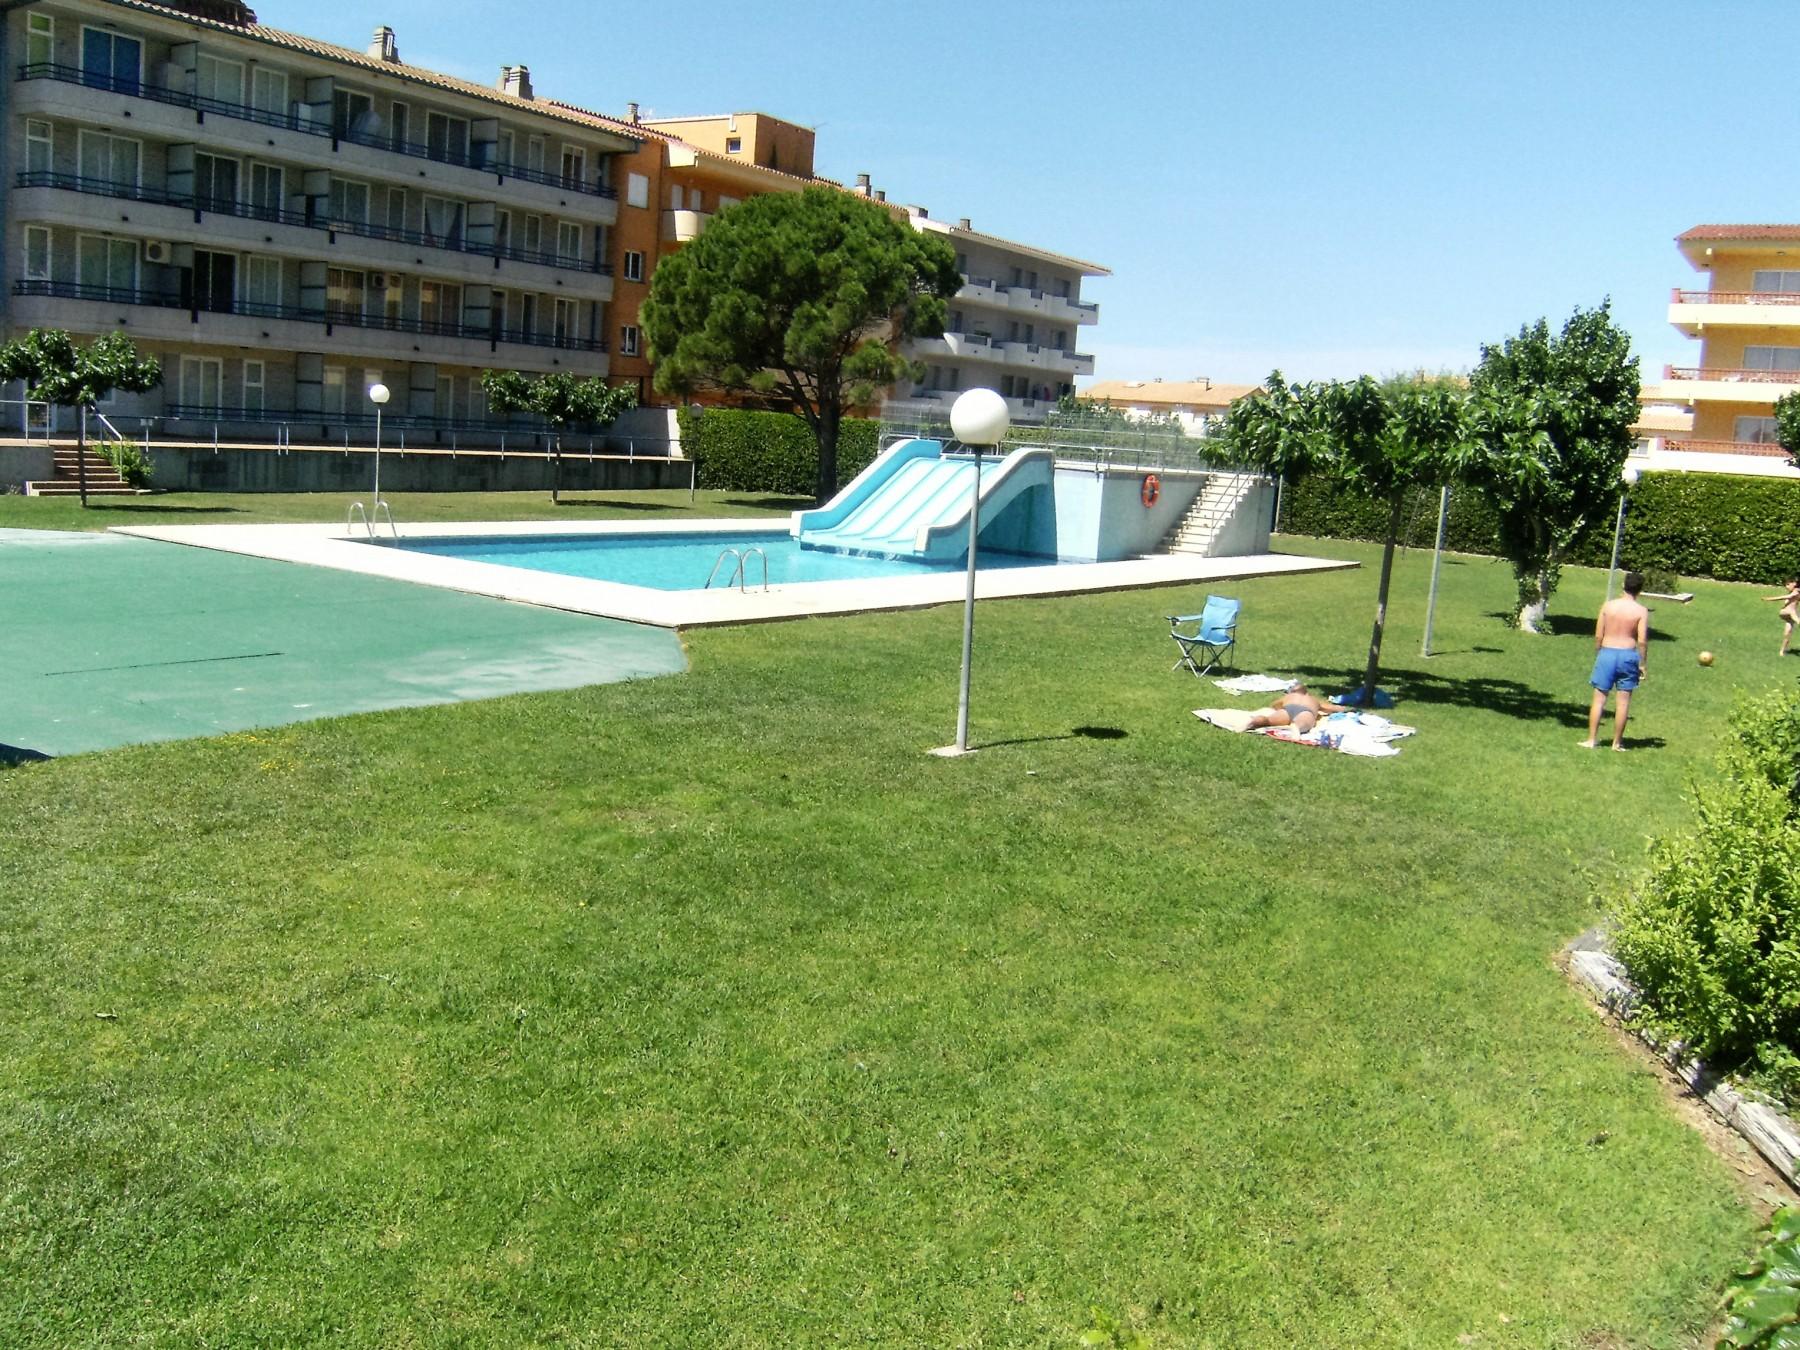 BLAU PARK 326 for 4 guests in L Estartit, Spain